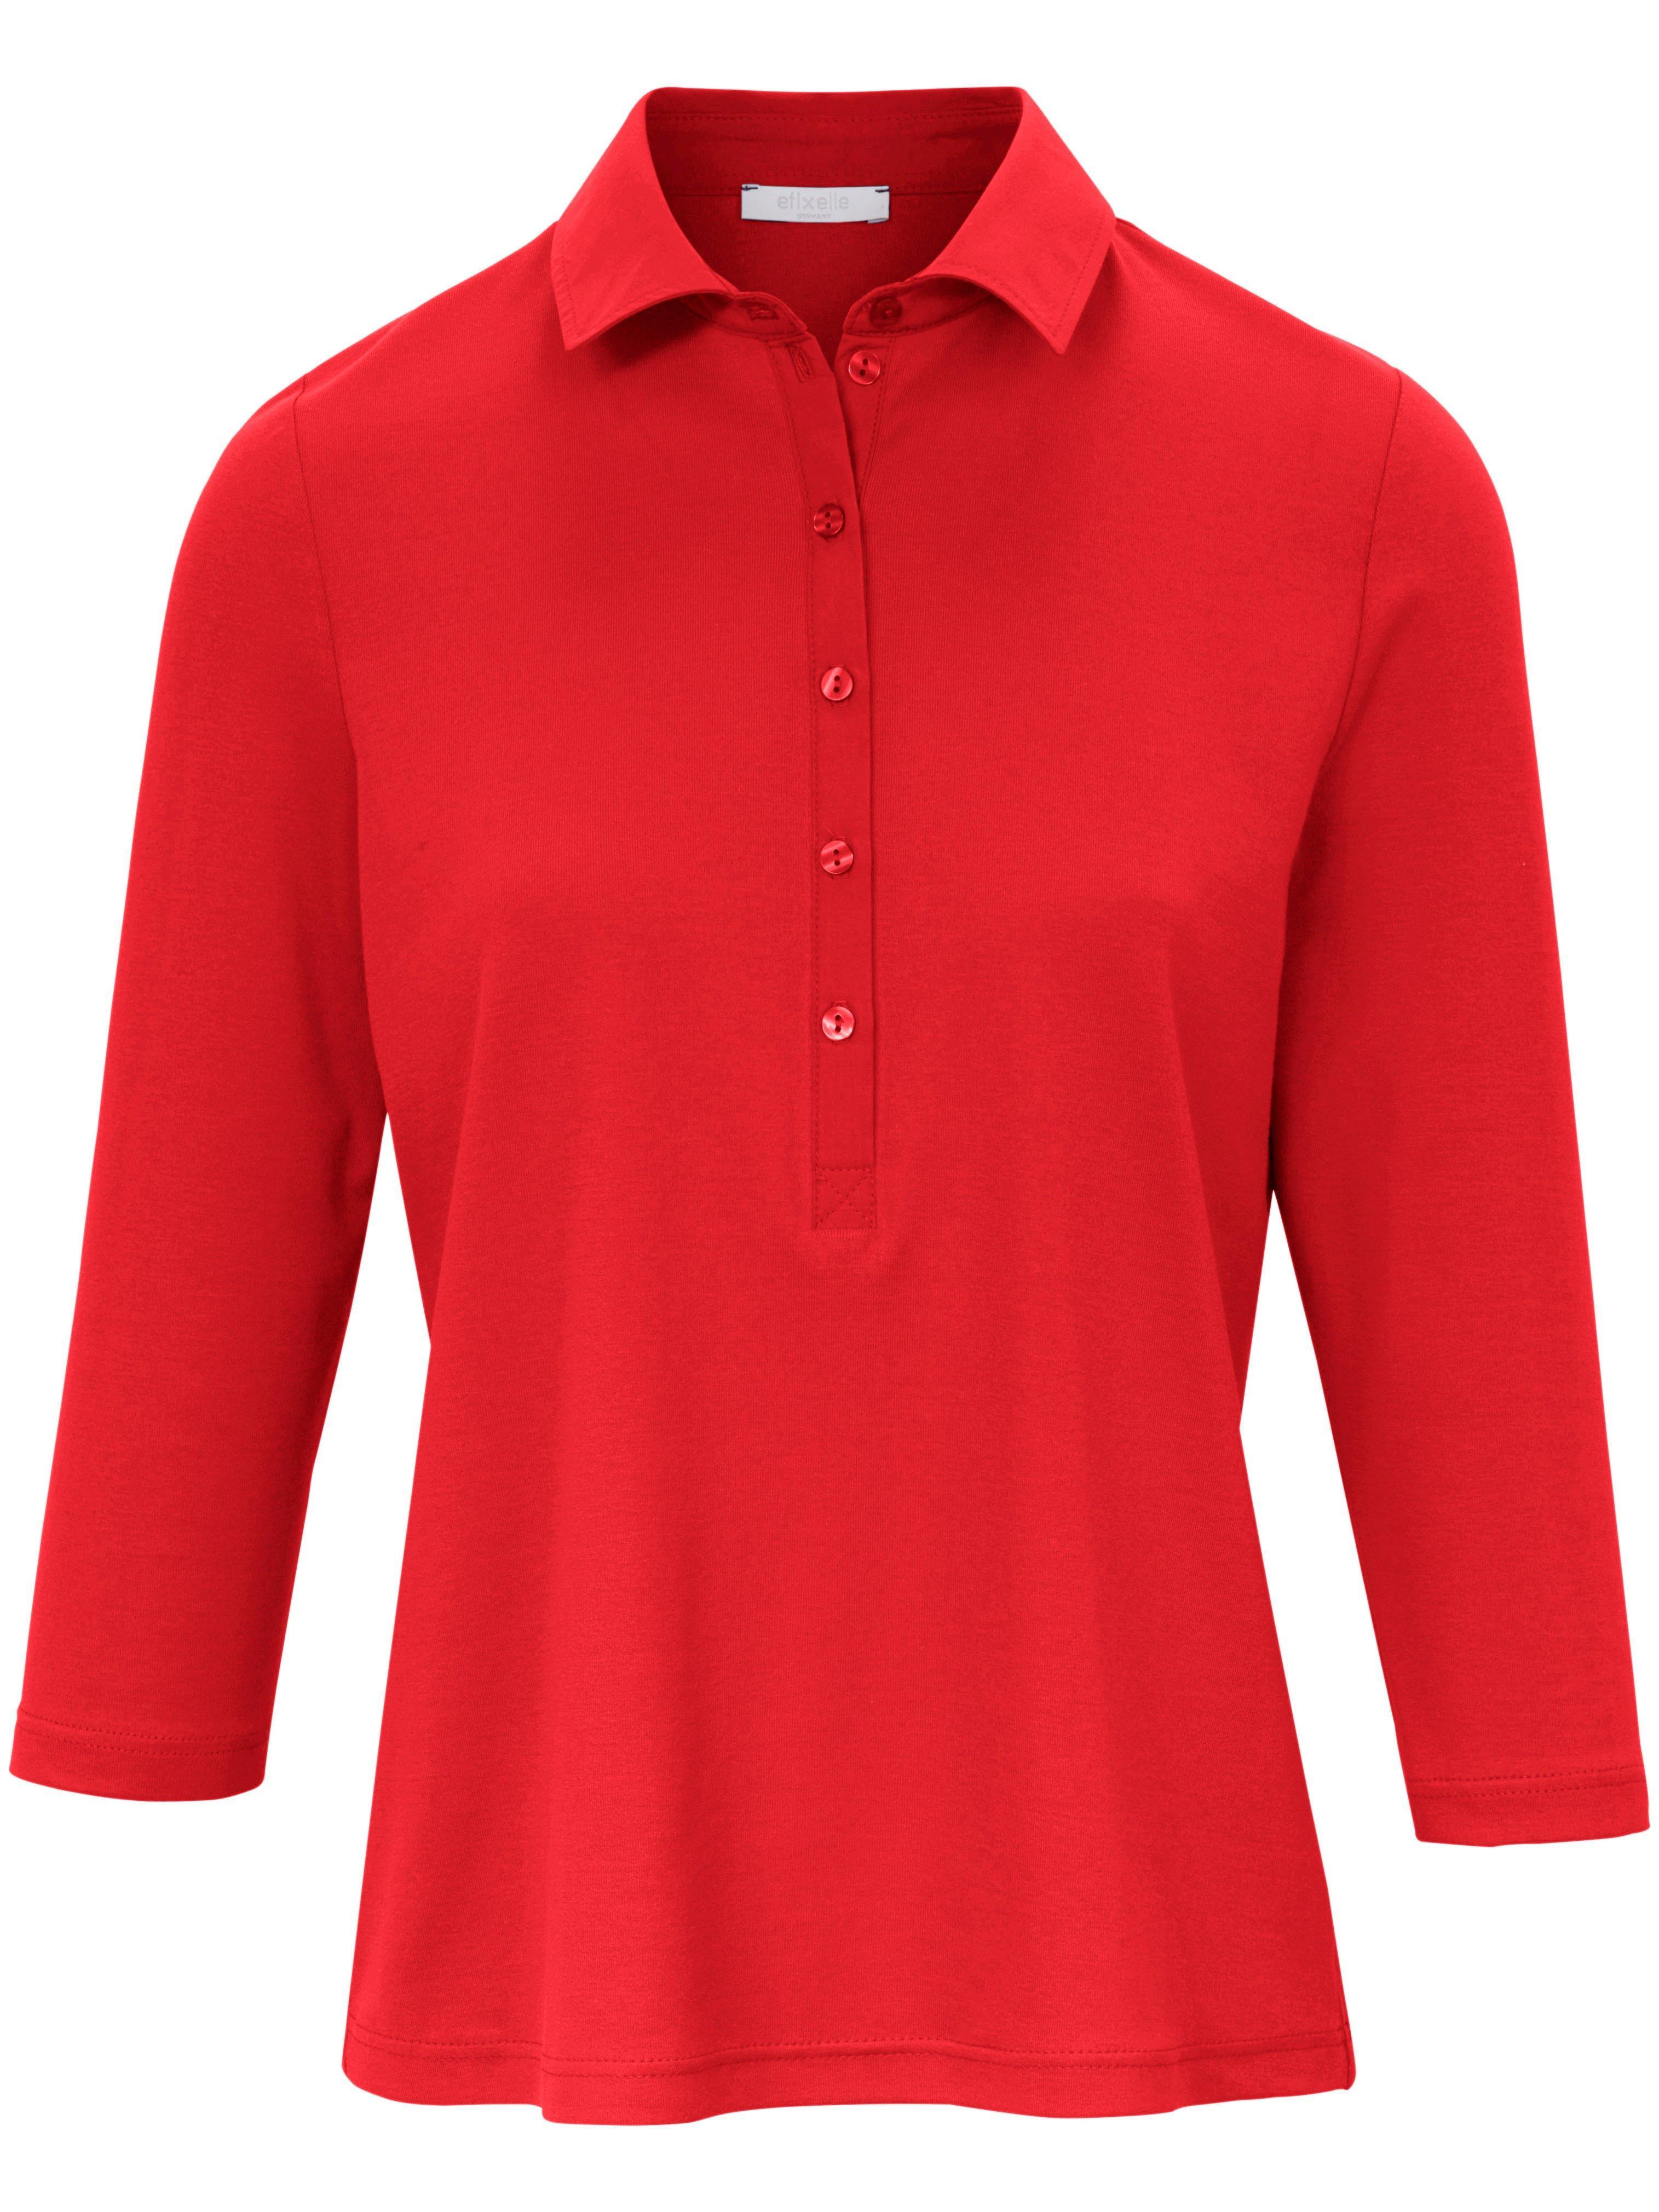 Damen Polo-Shirt 3/4-Arm Efixelle rot | Plus Size |